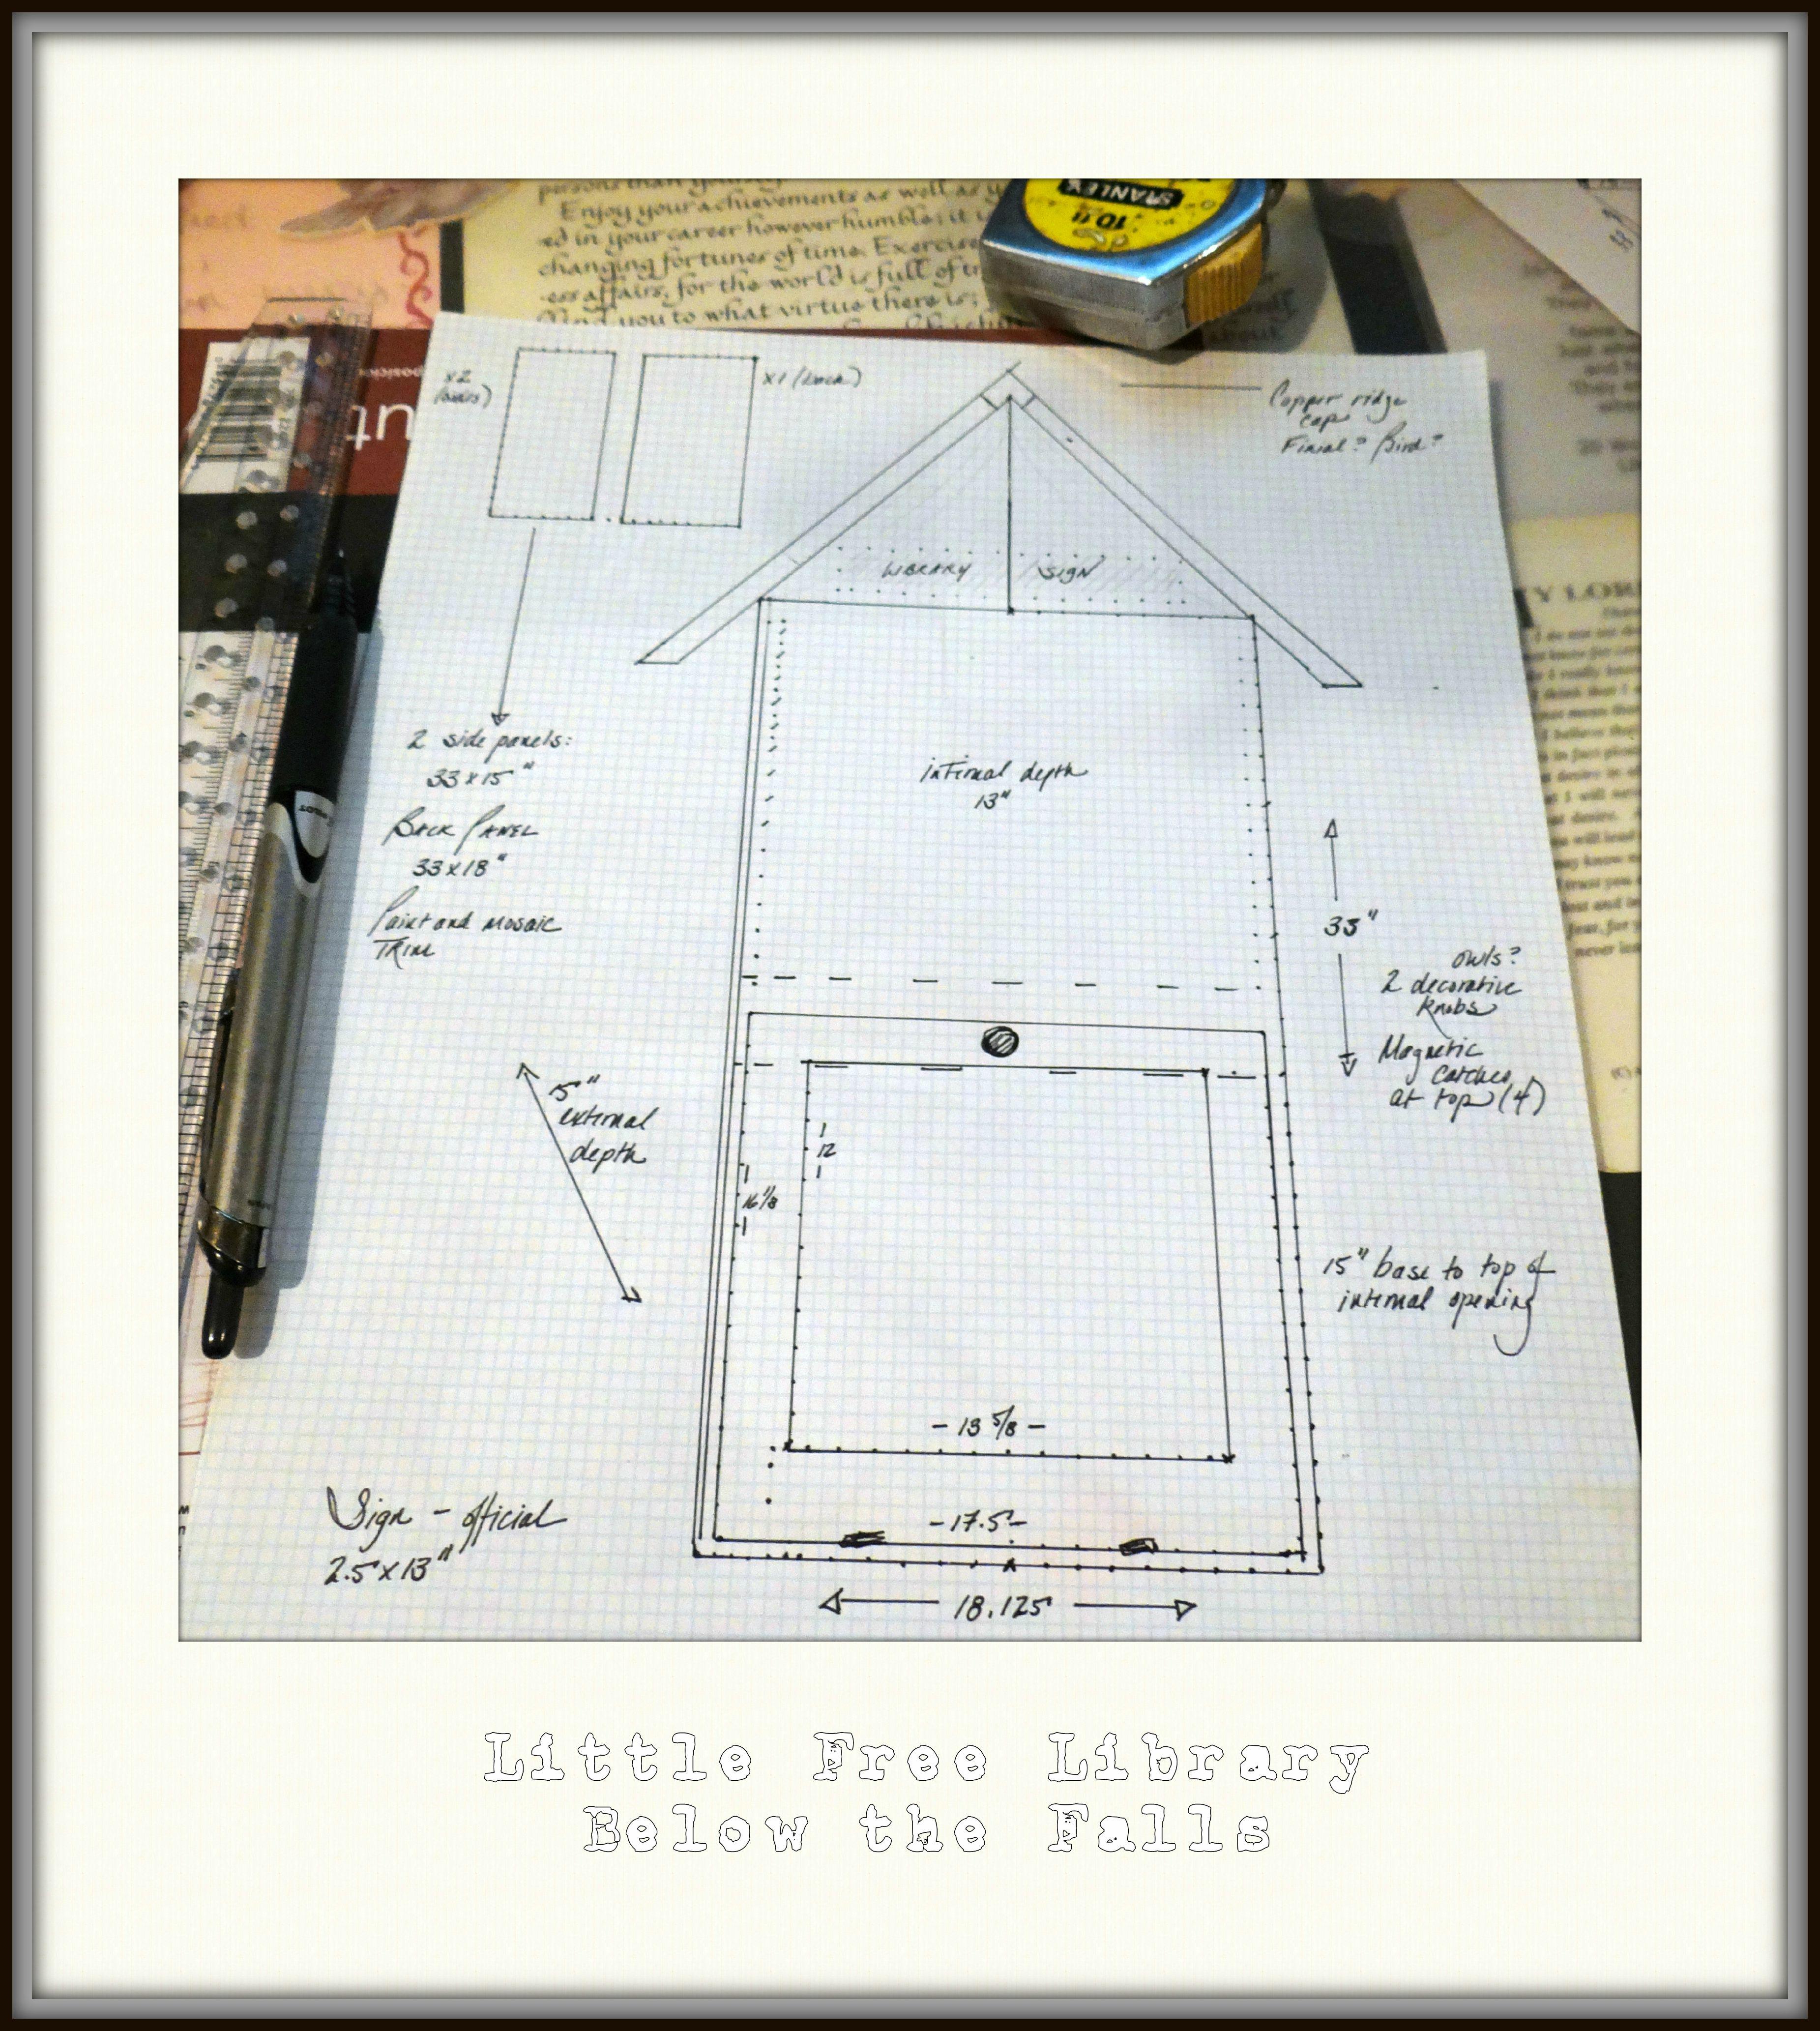 Portable building plans for a cabinet